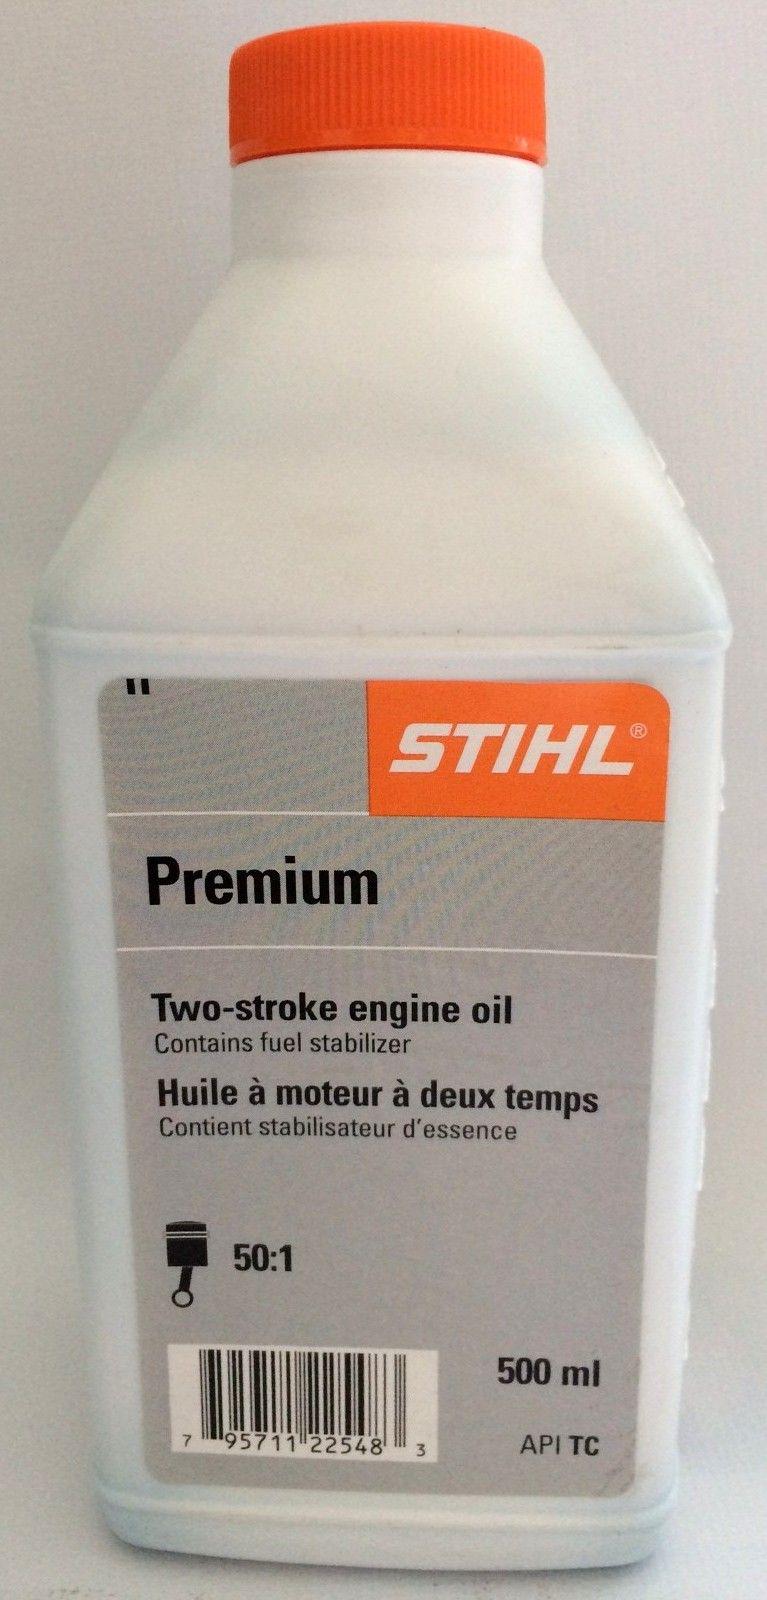 STIHL 500mL bottle of Premium 2-stroke engine oil